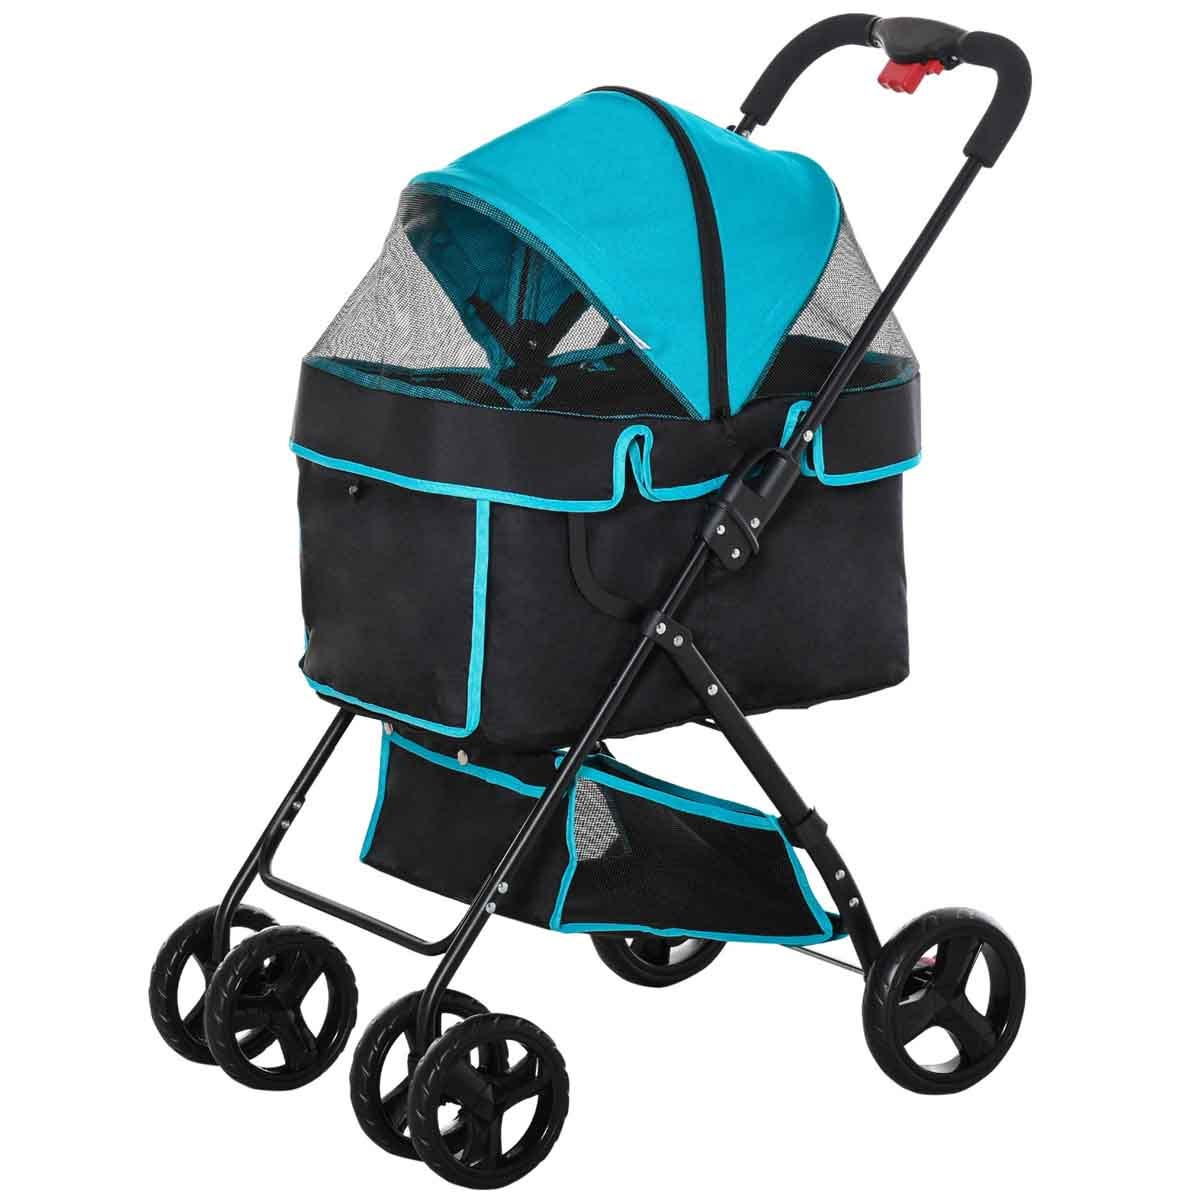 PawHut Foldable Pet Stroller/Basket Carriage w/Brake - Black